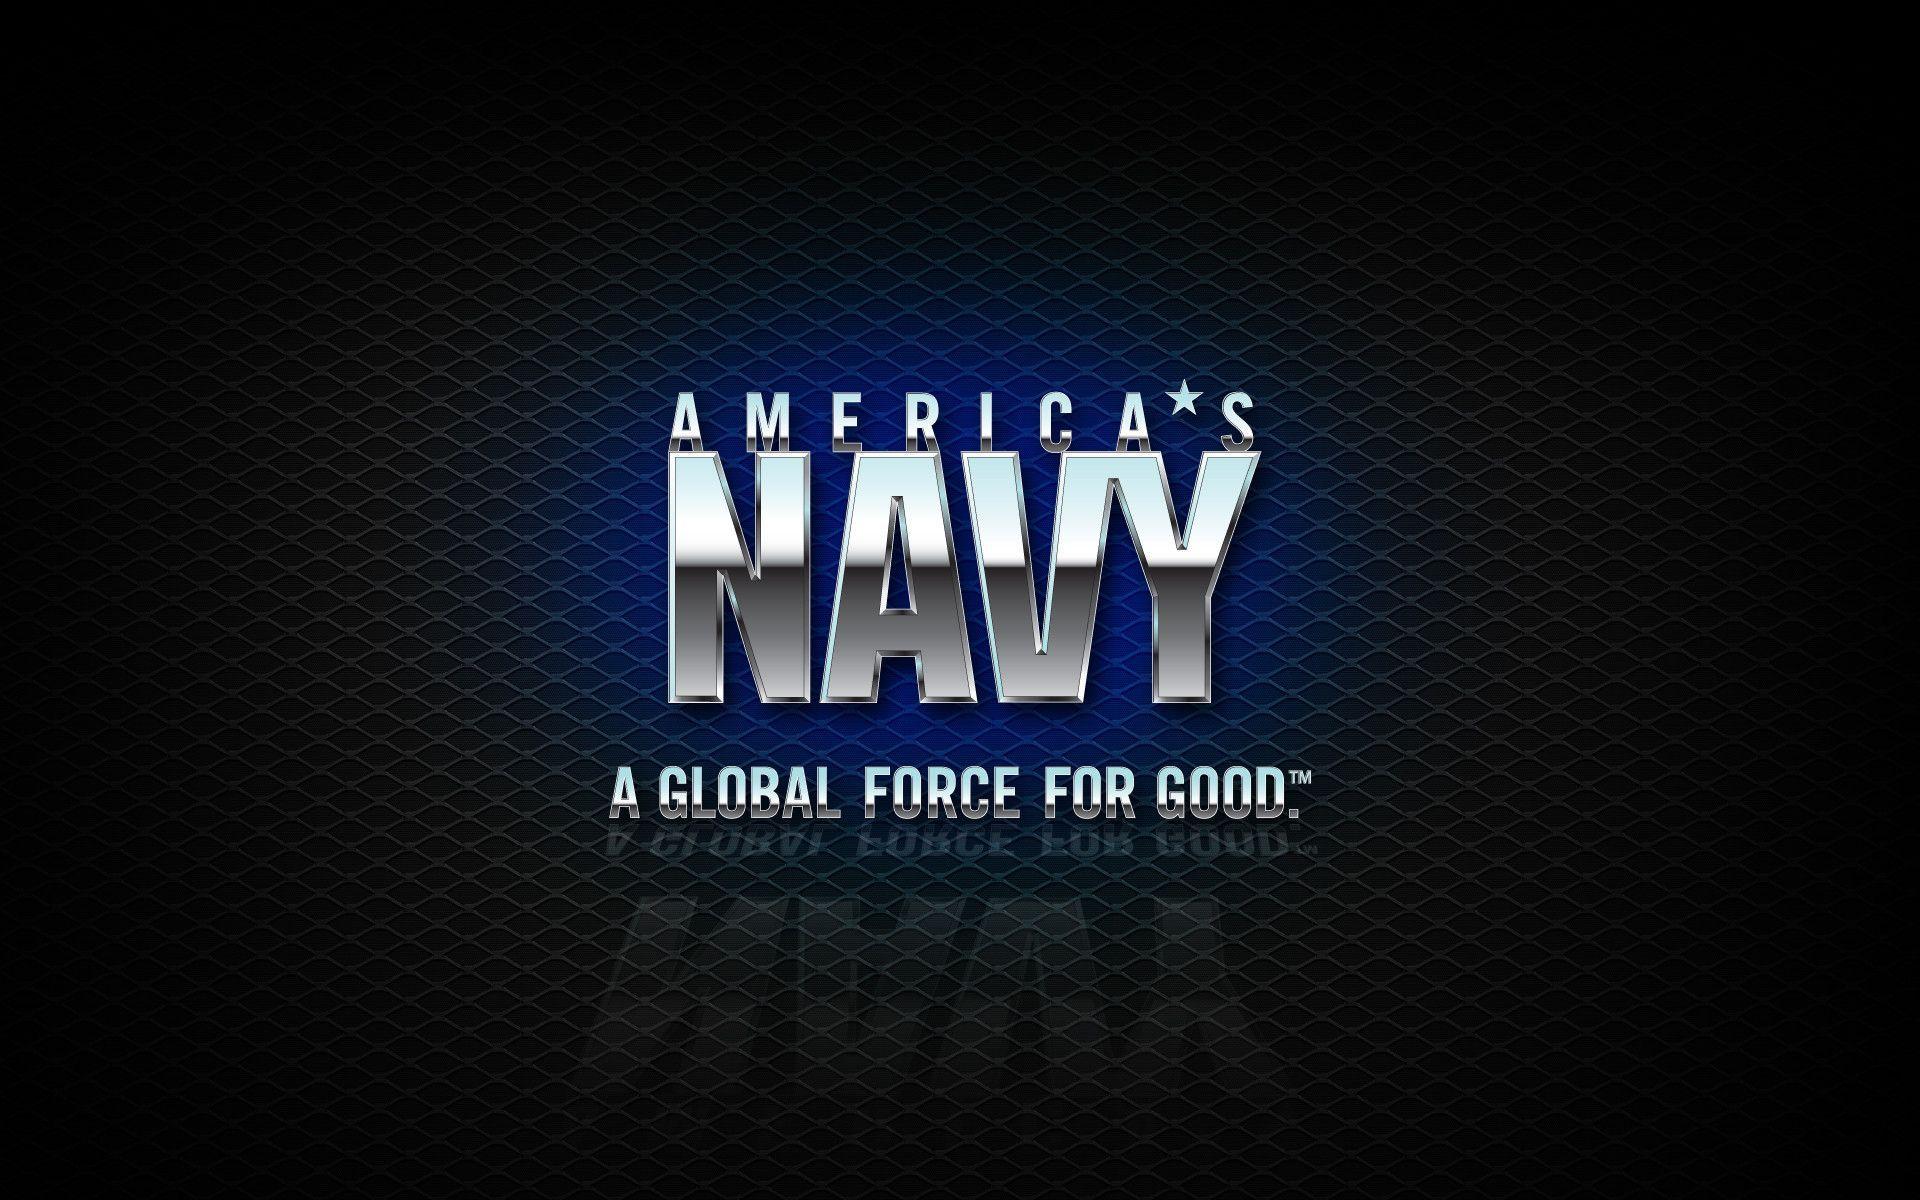 United States Navy Wallpaper   52DazheW Gallery 1920x1200